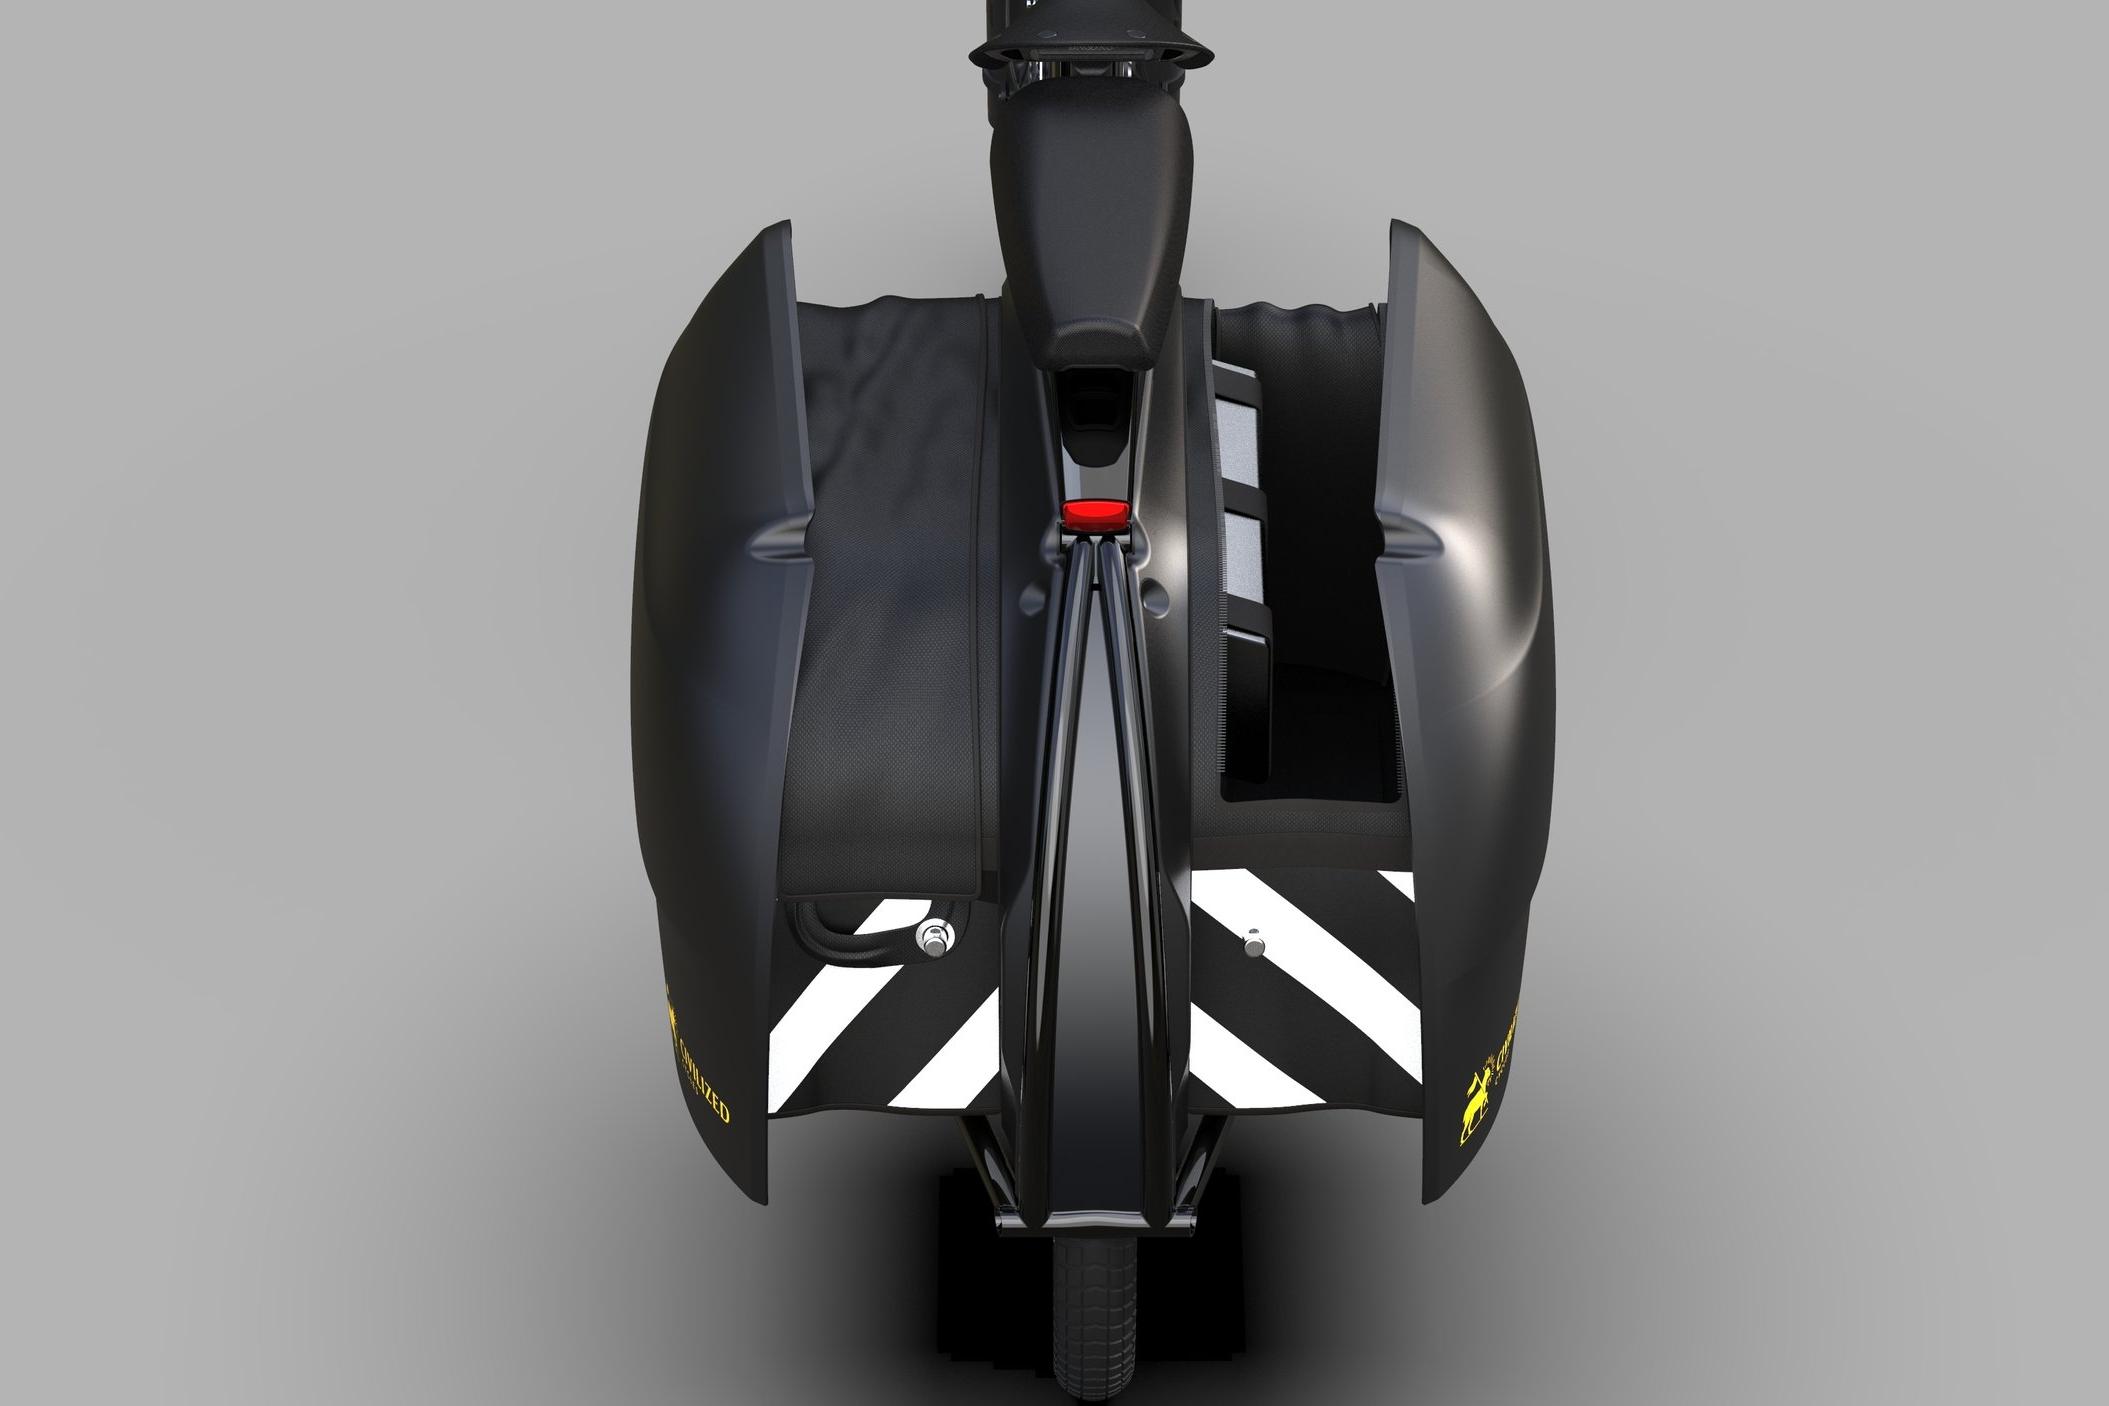 Civ1 pannier open top rear.jpg